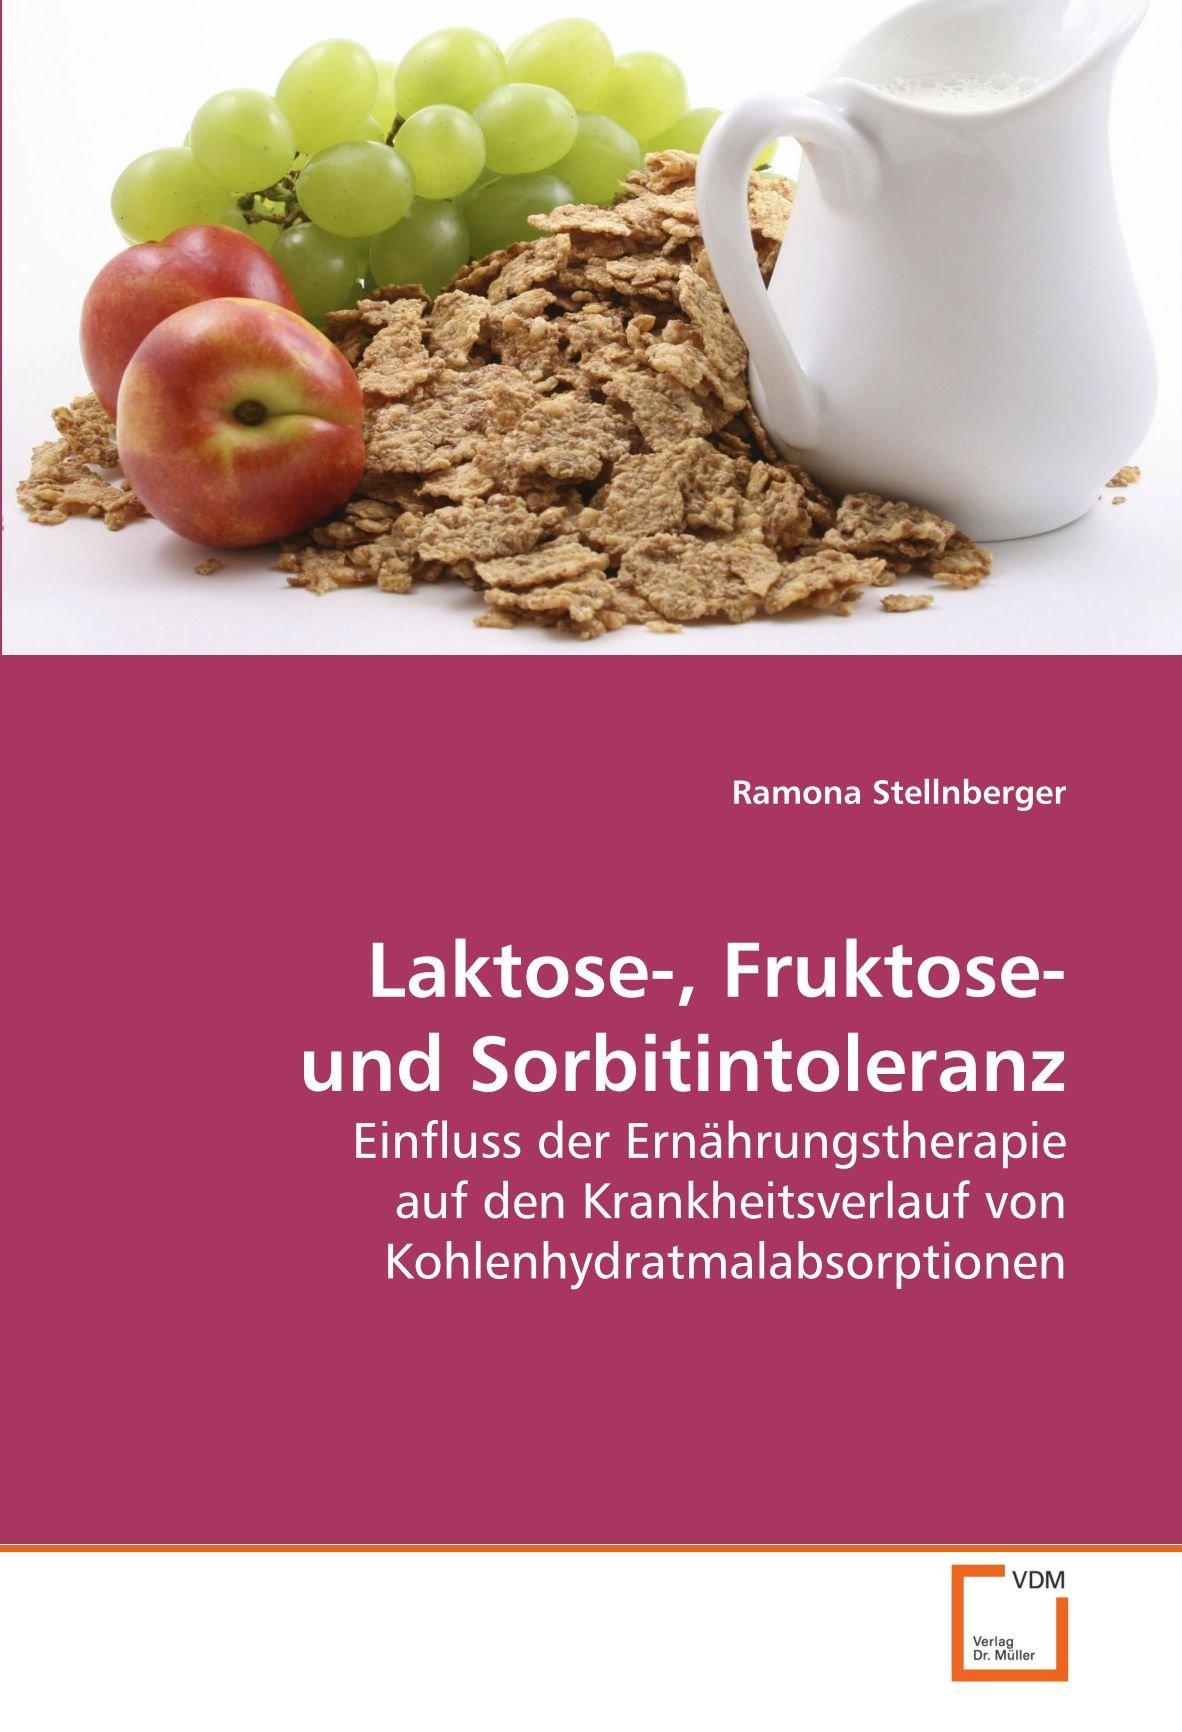 Laktose-Fructose- und Sorbit-Intoleranz-Diät